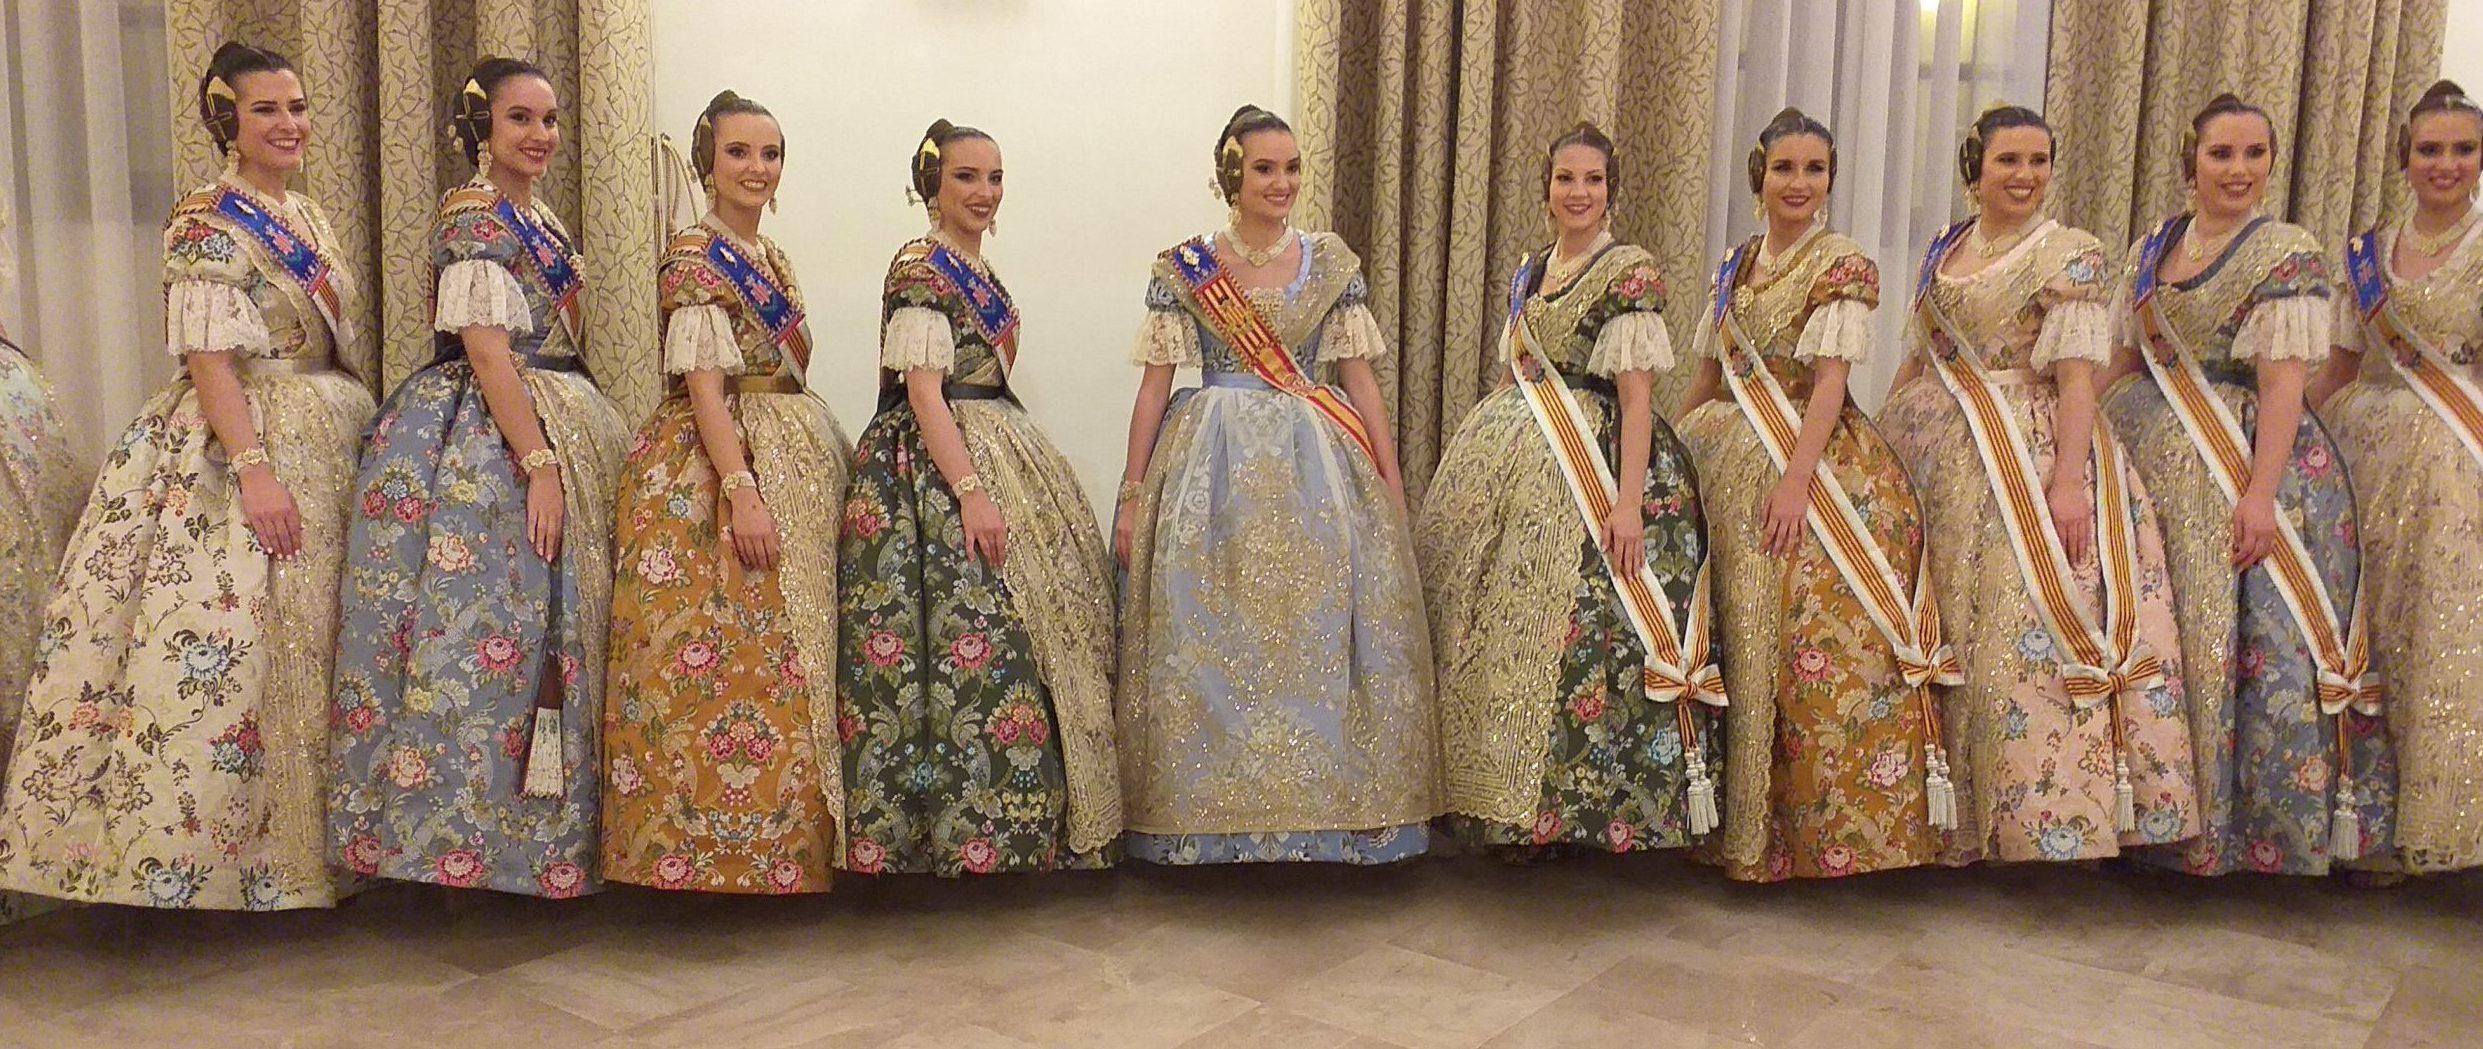 Девушки, претендующие на звание Королева Фальяс